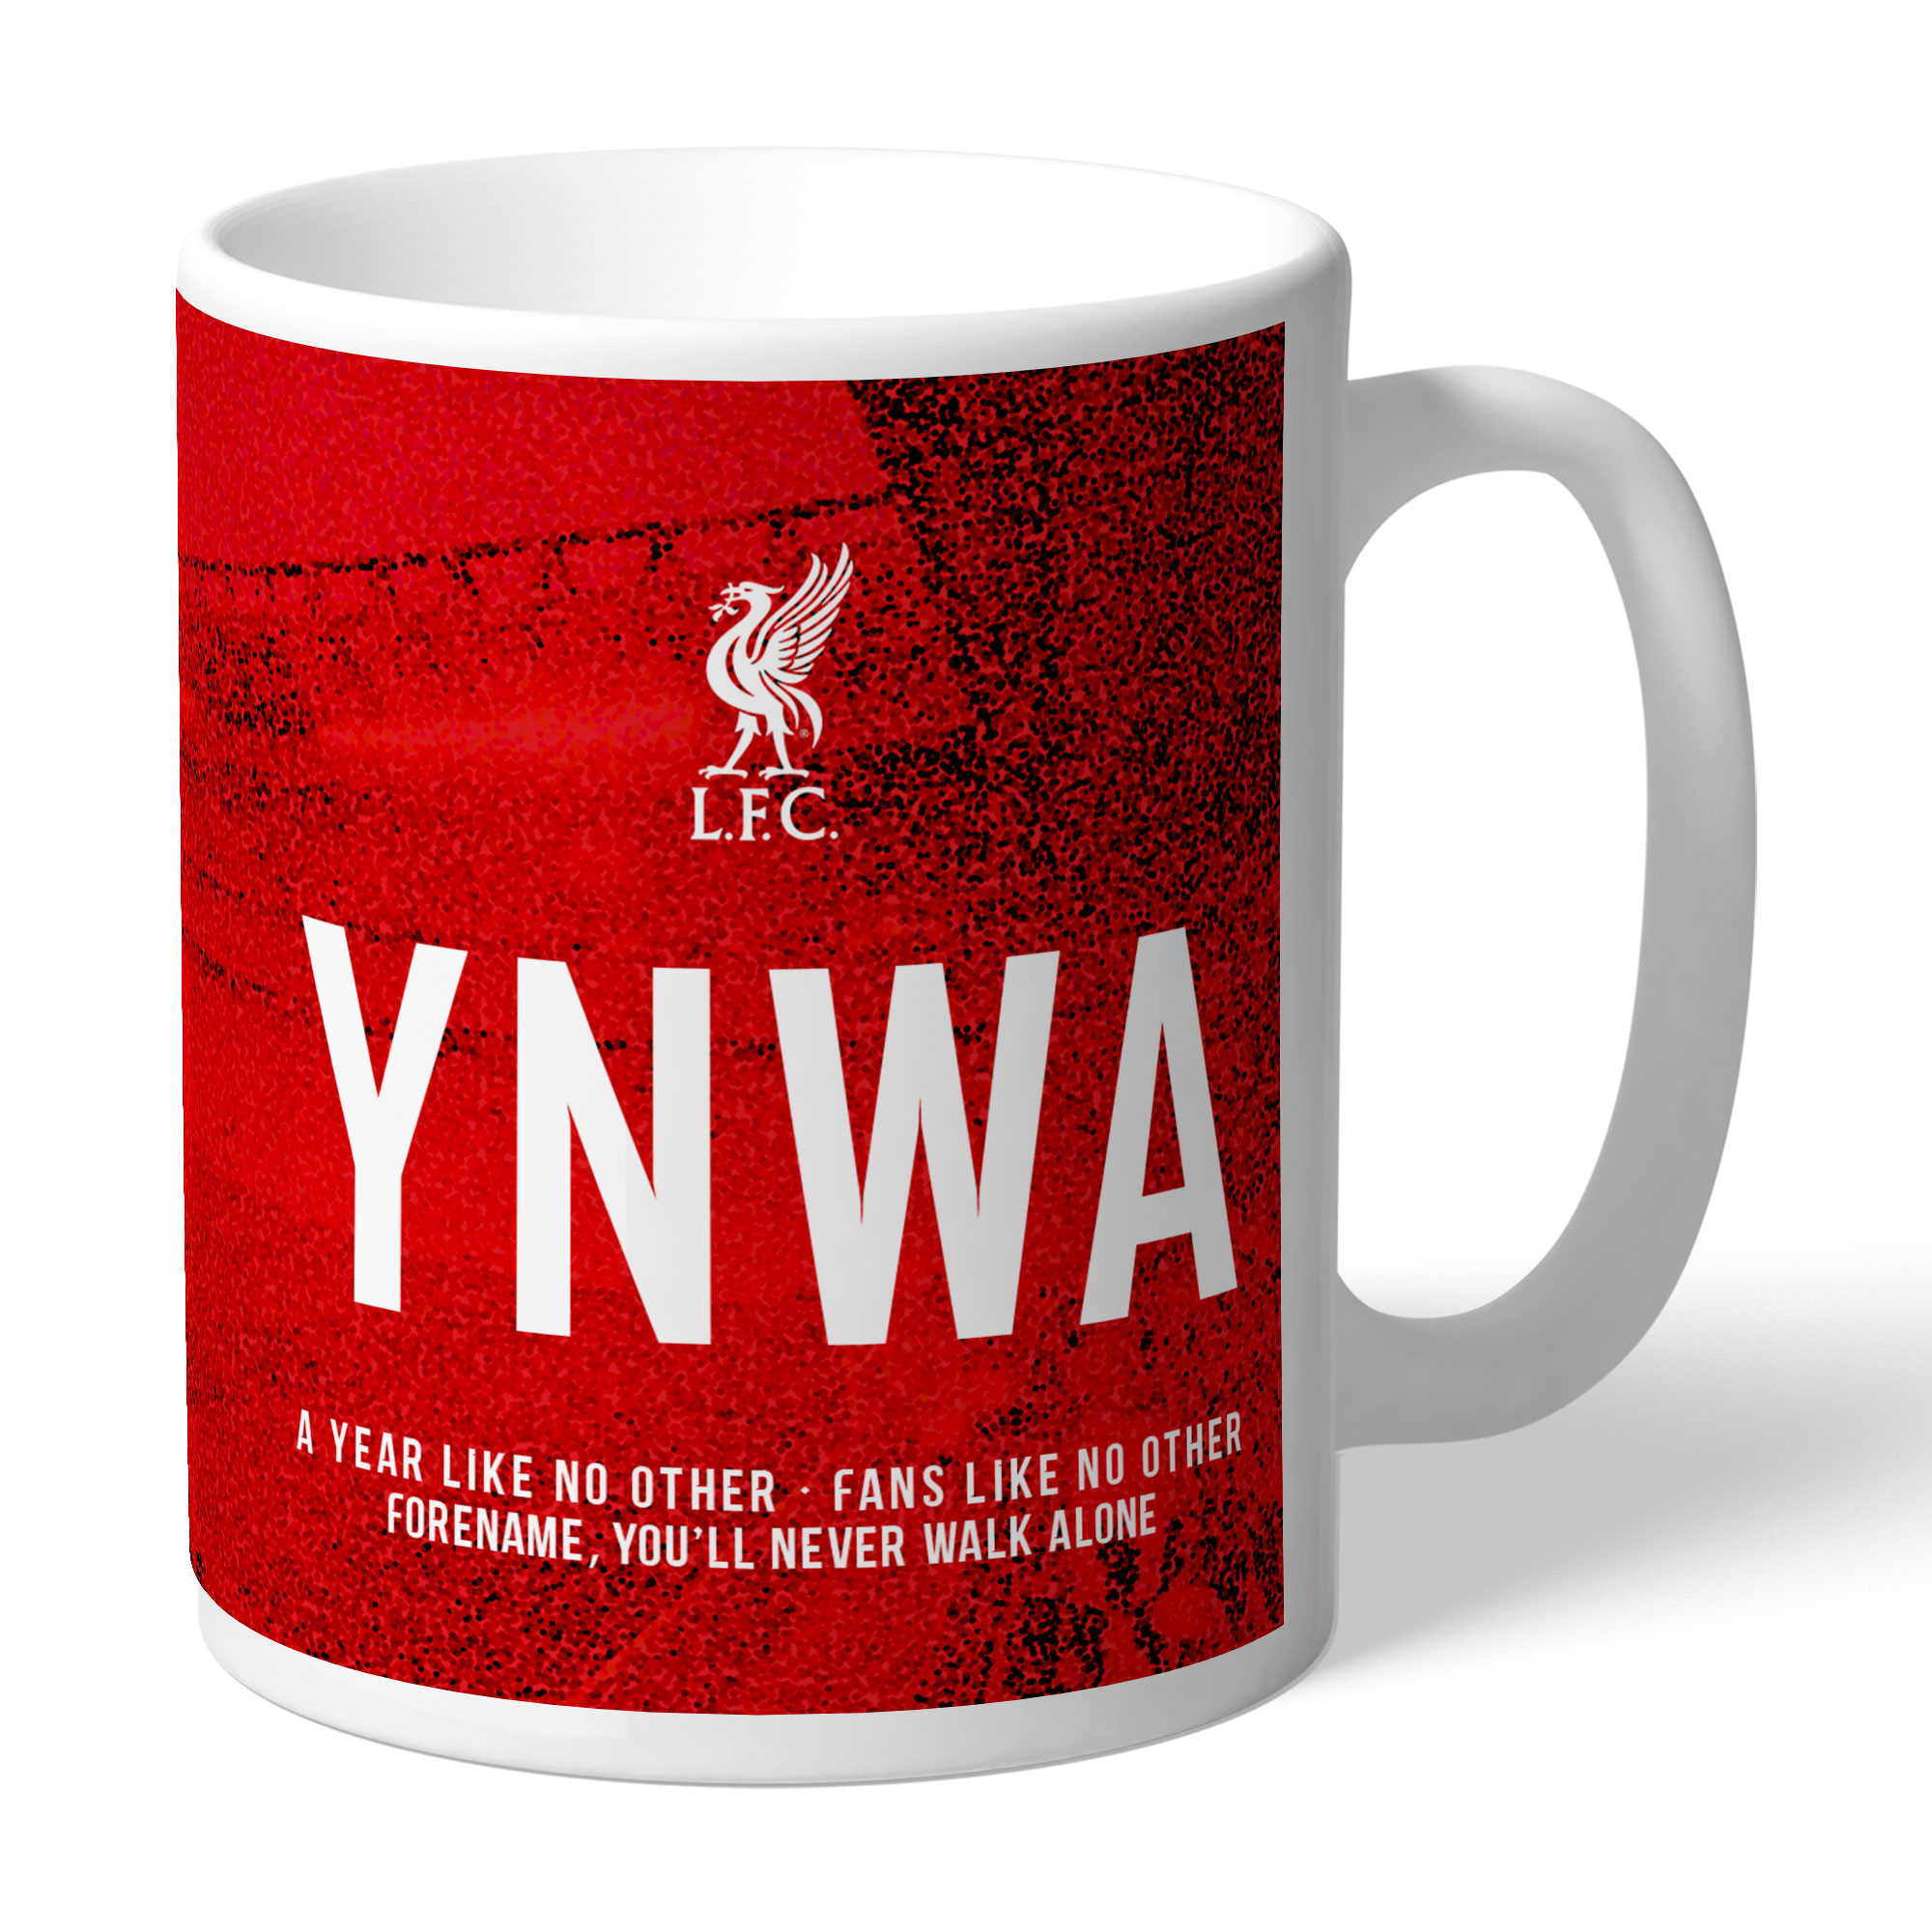 Liverpool FC Champions 2020 YNWA Mug